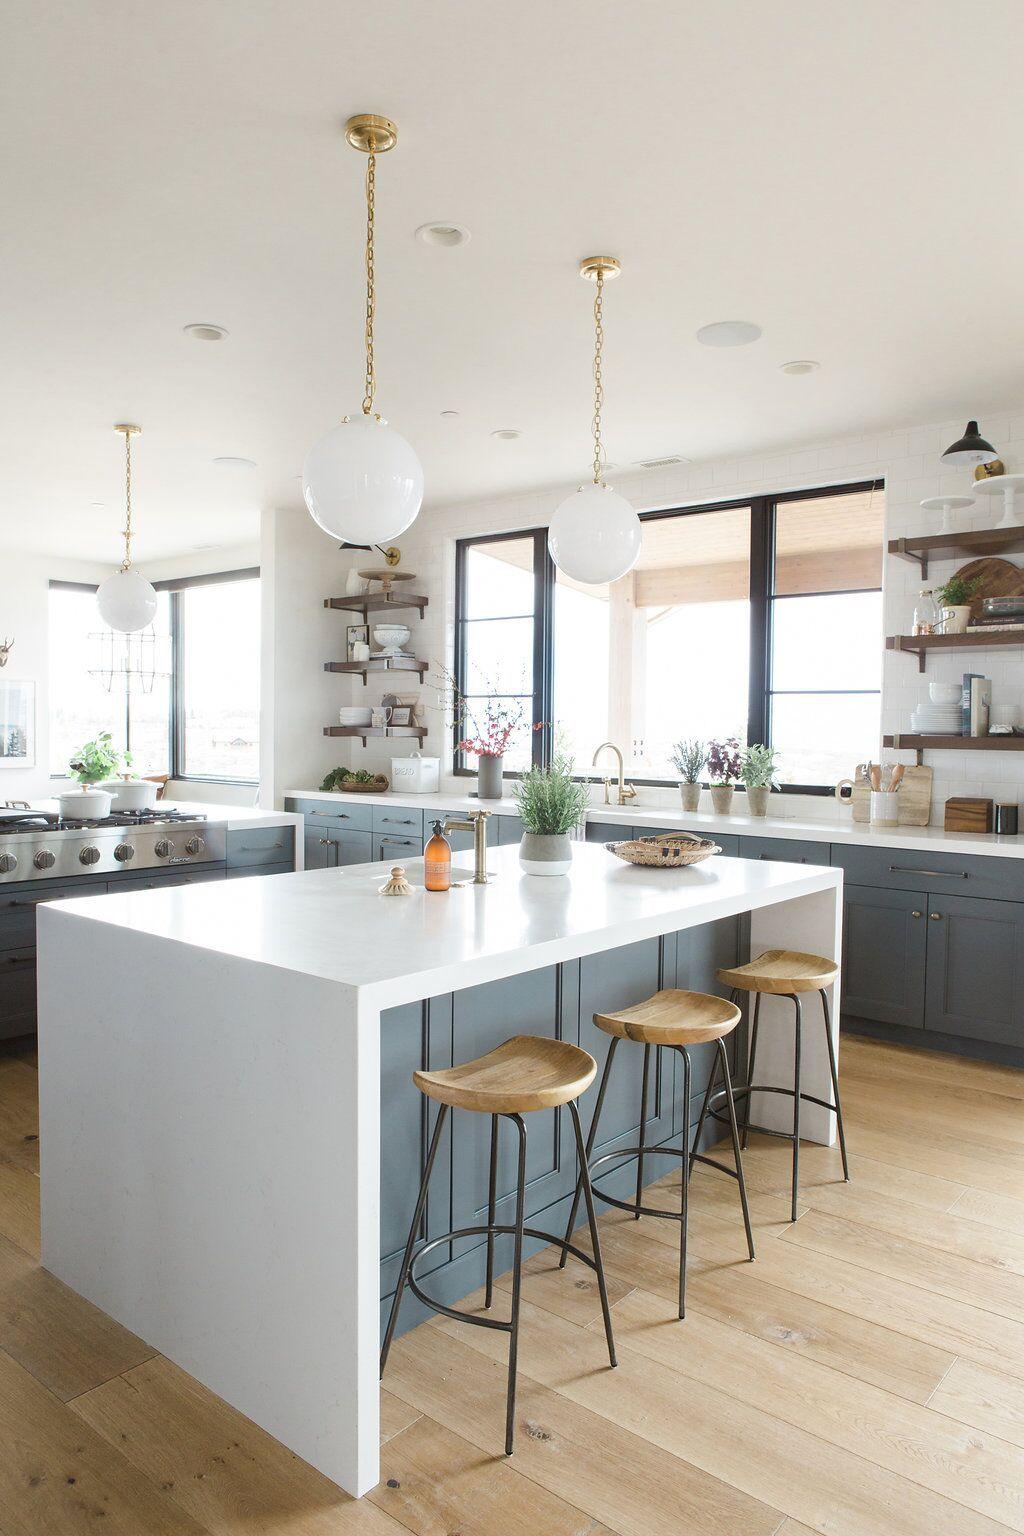 Kitchen Bar Stools003